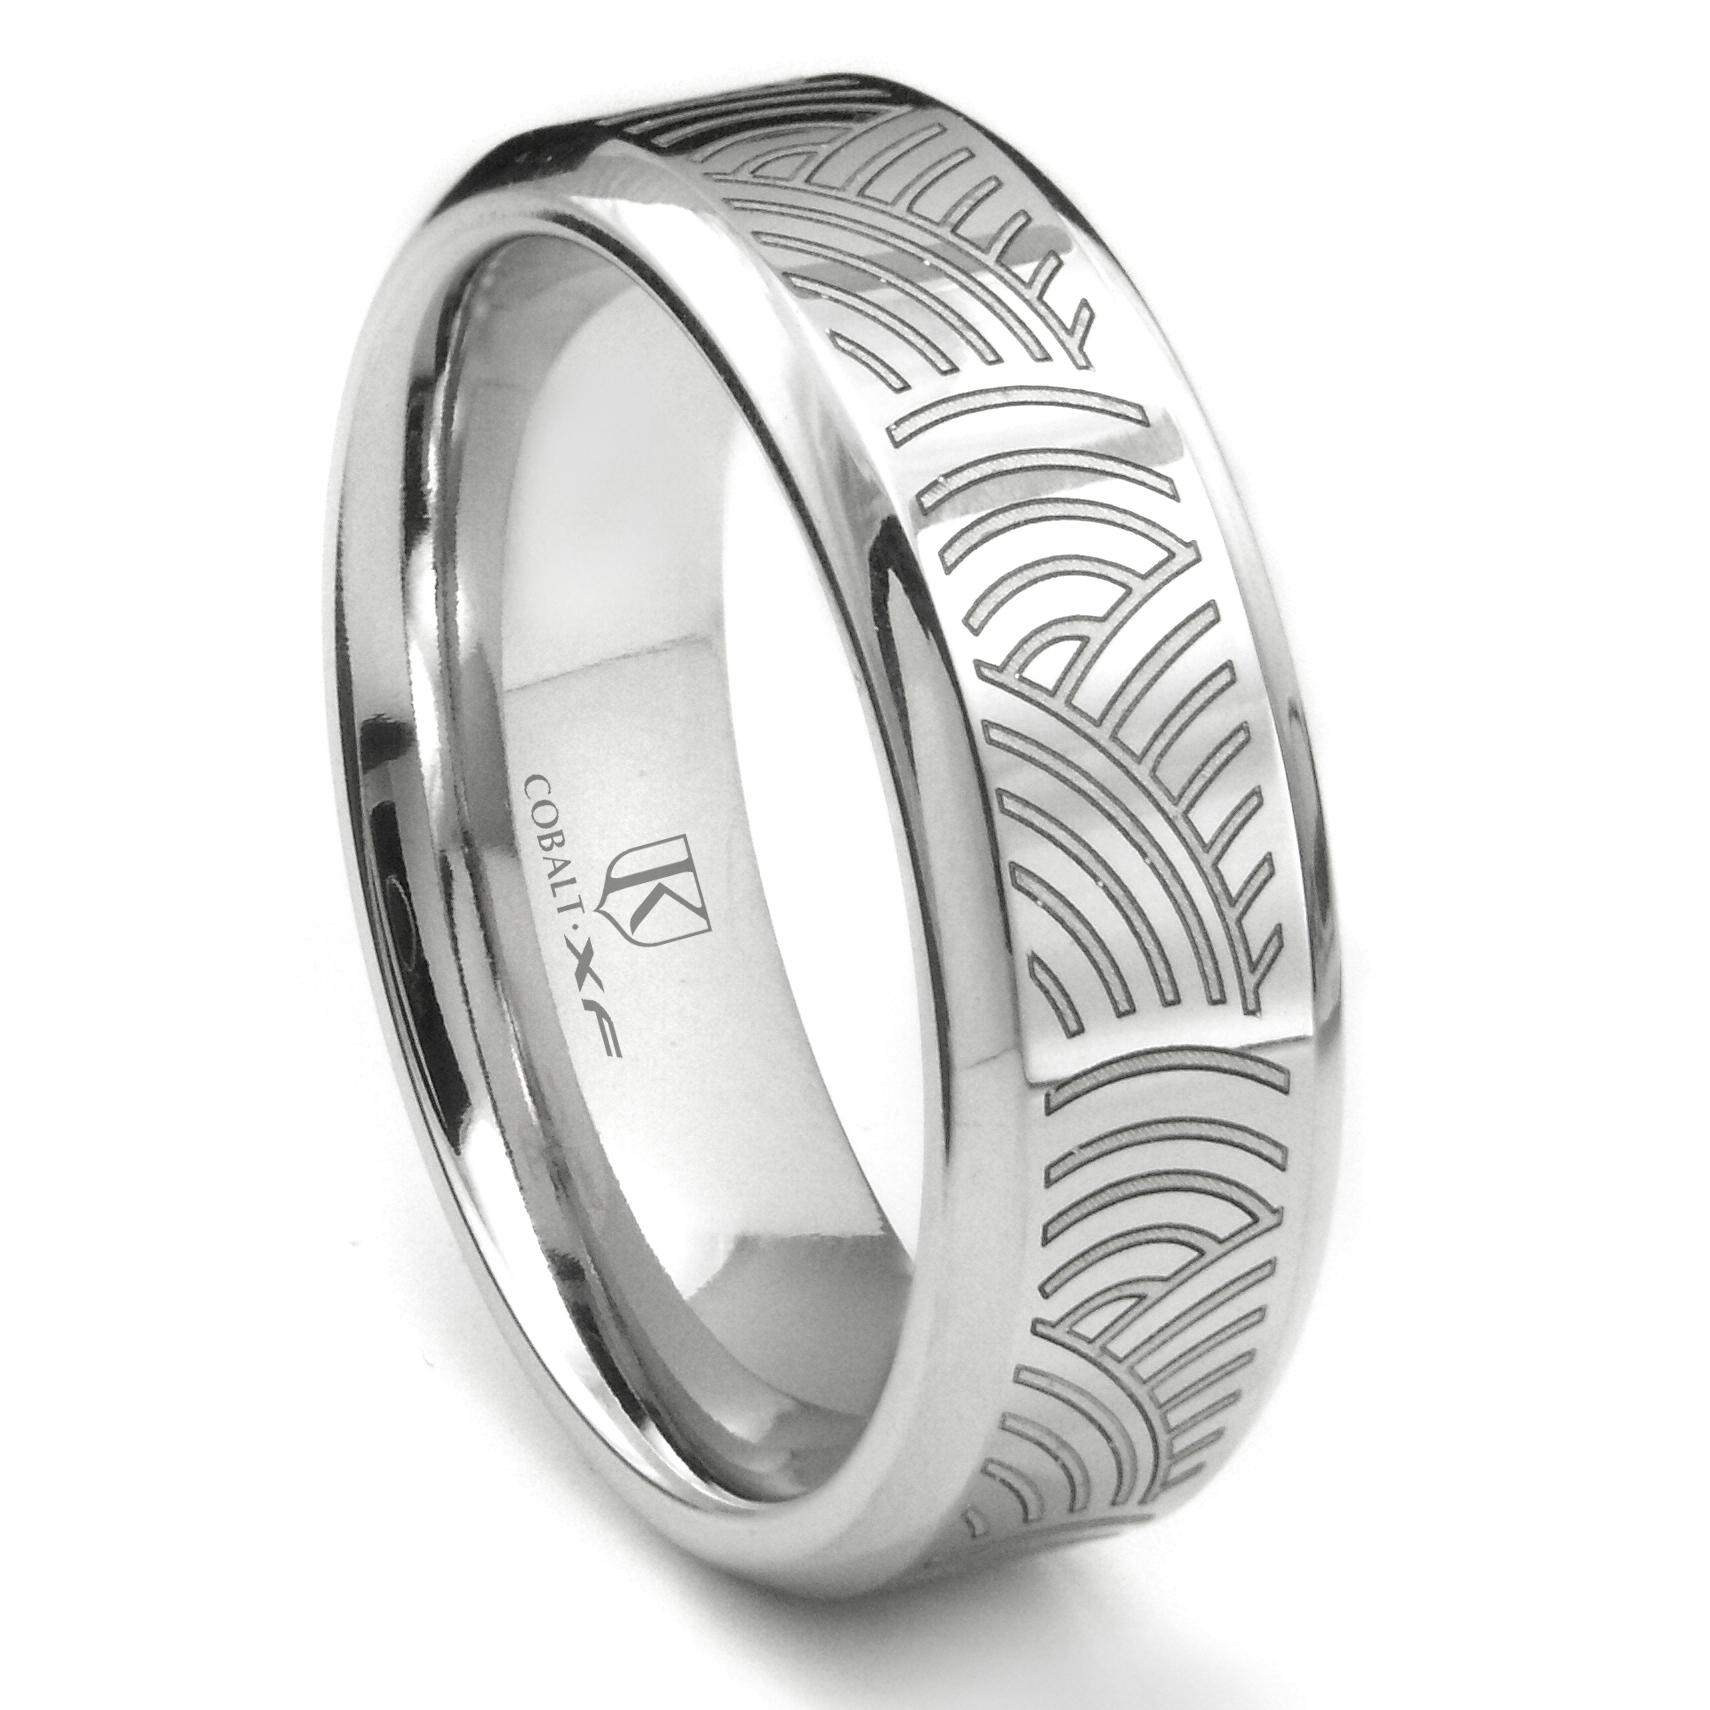 Cobalt XF Chrome Laser Engraved Wedding Band Ring w Ripple Designs